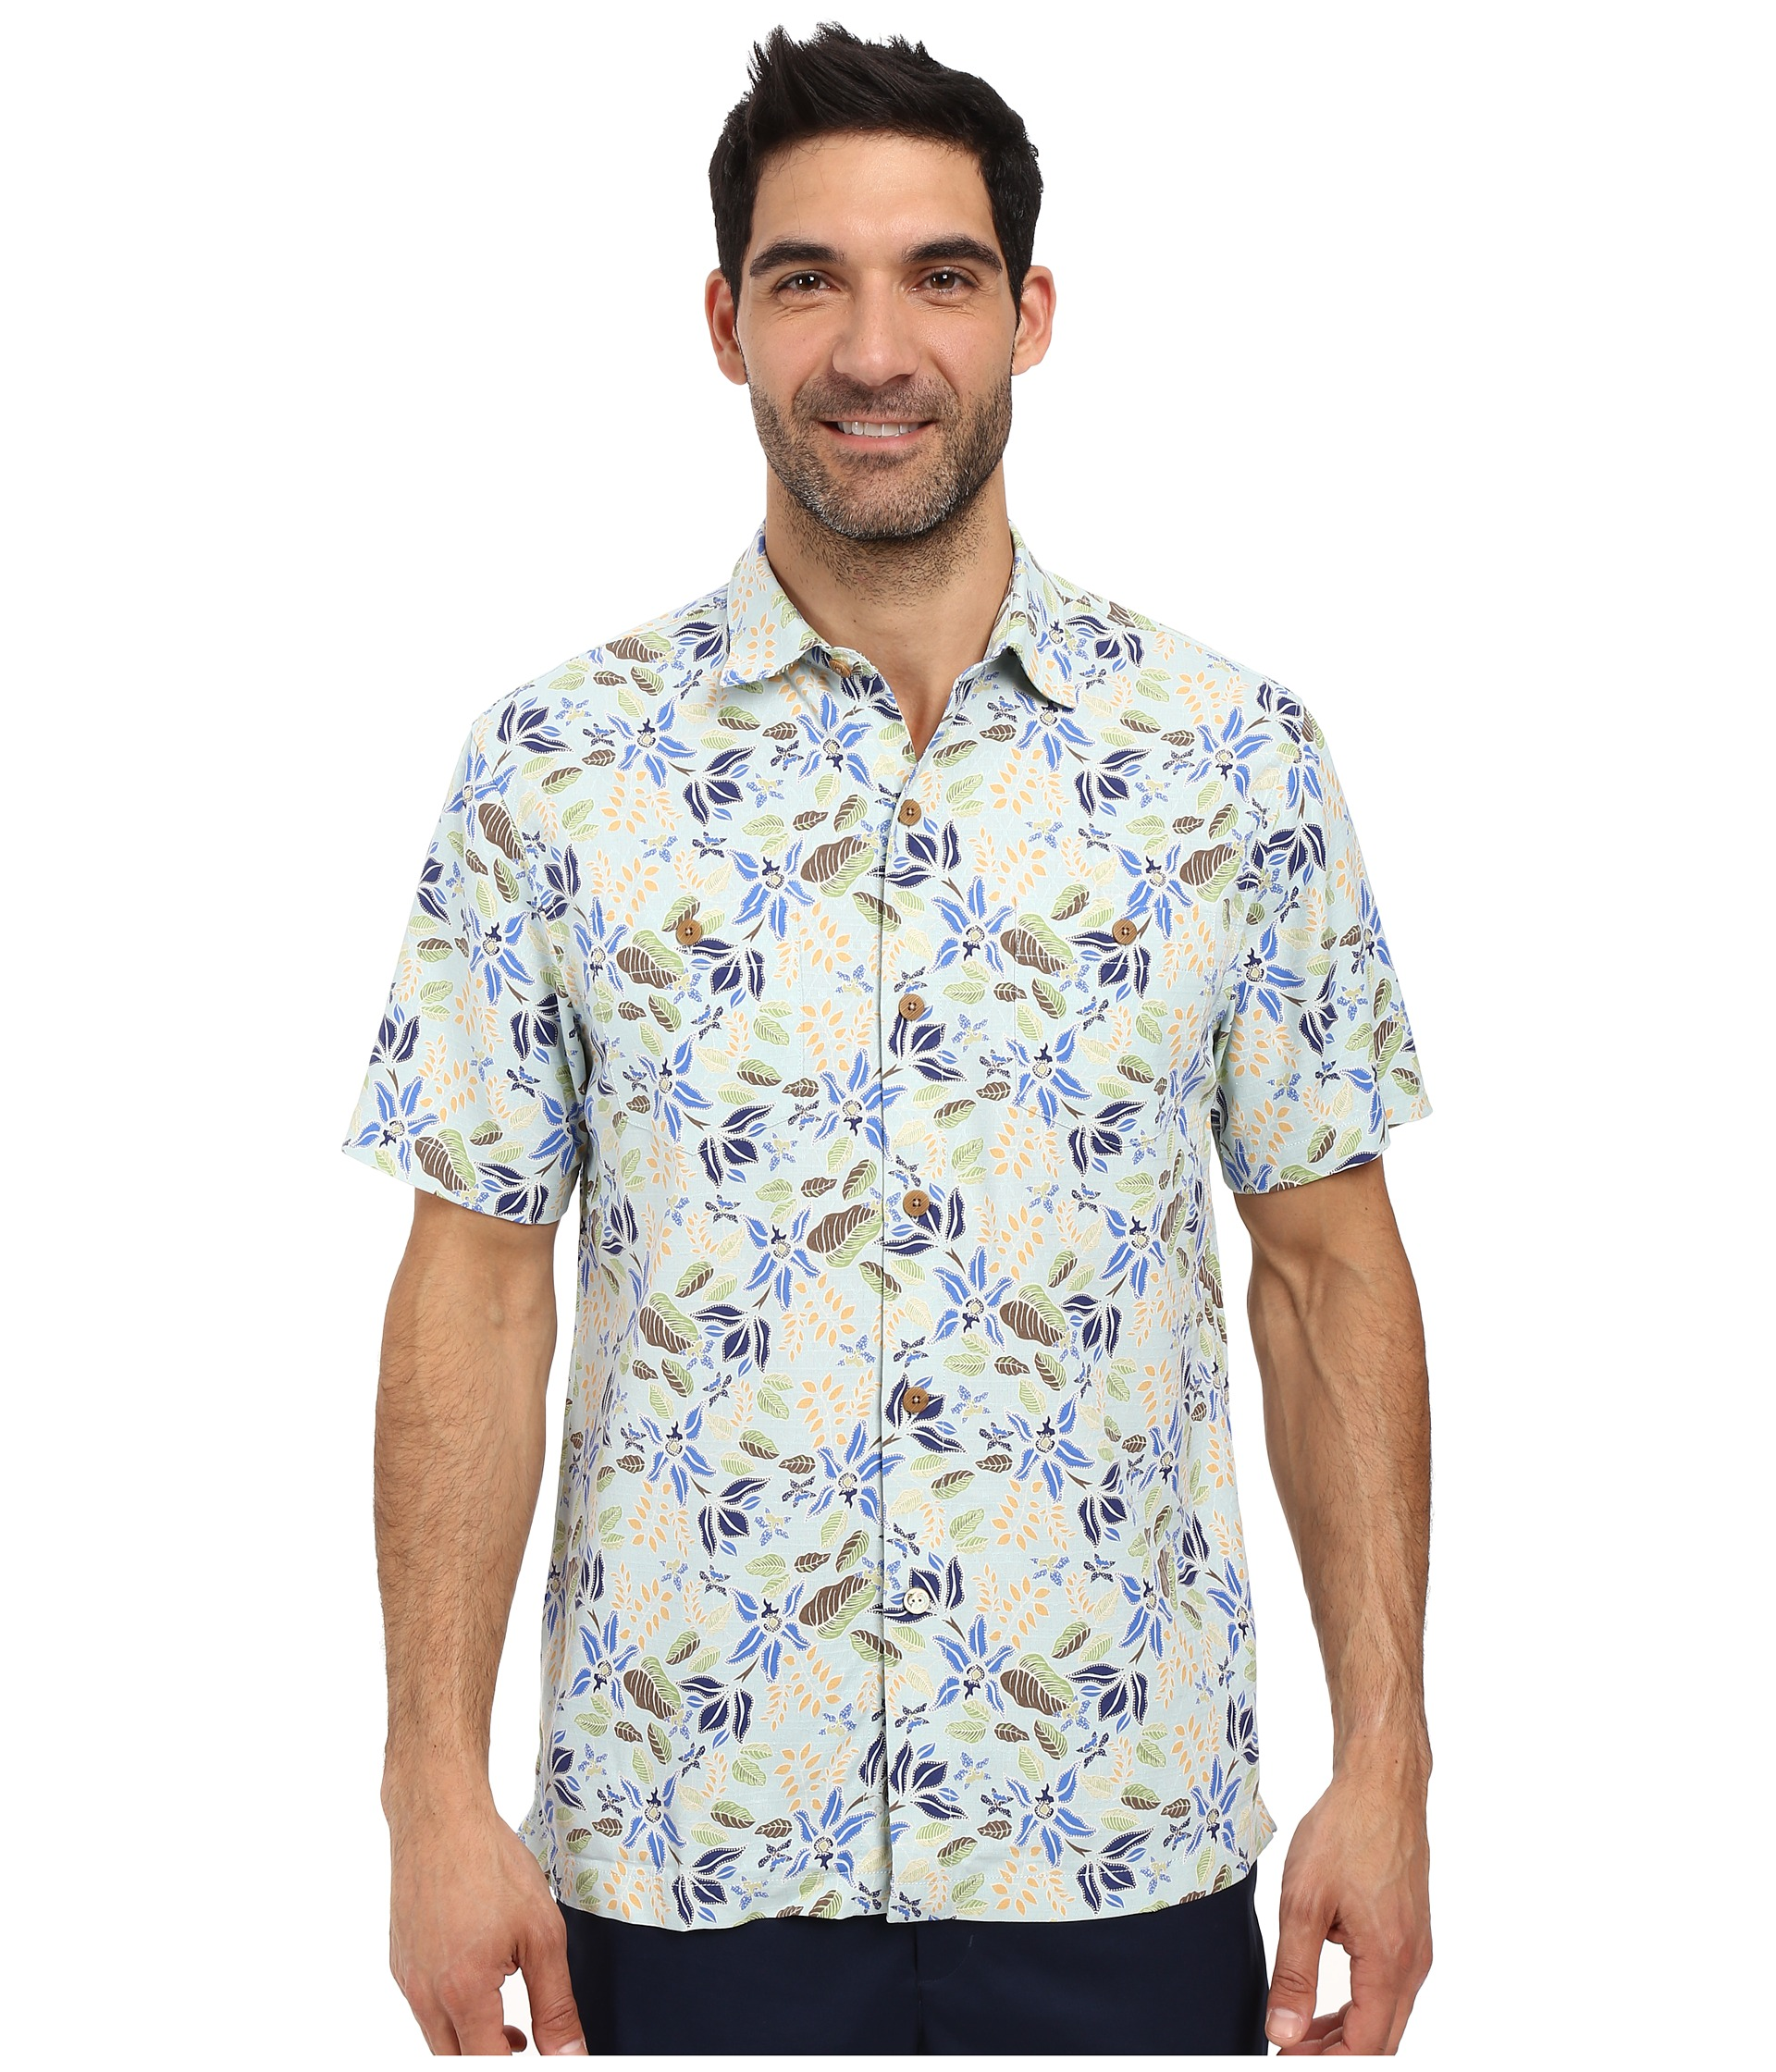 Tommy bahama mariposa grove shirt at for Where to buy tommy bahama shirts